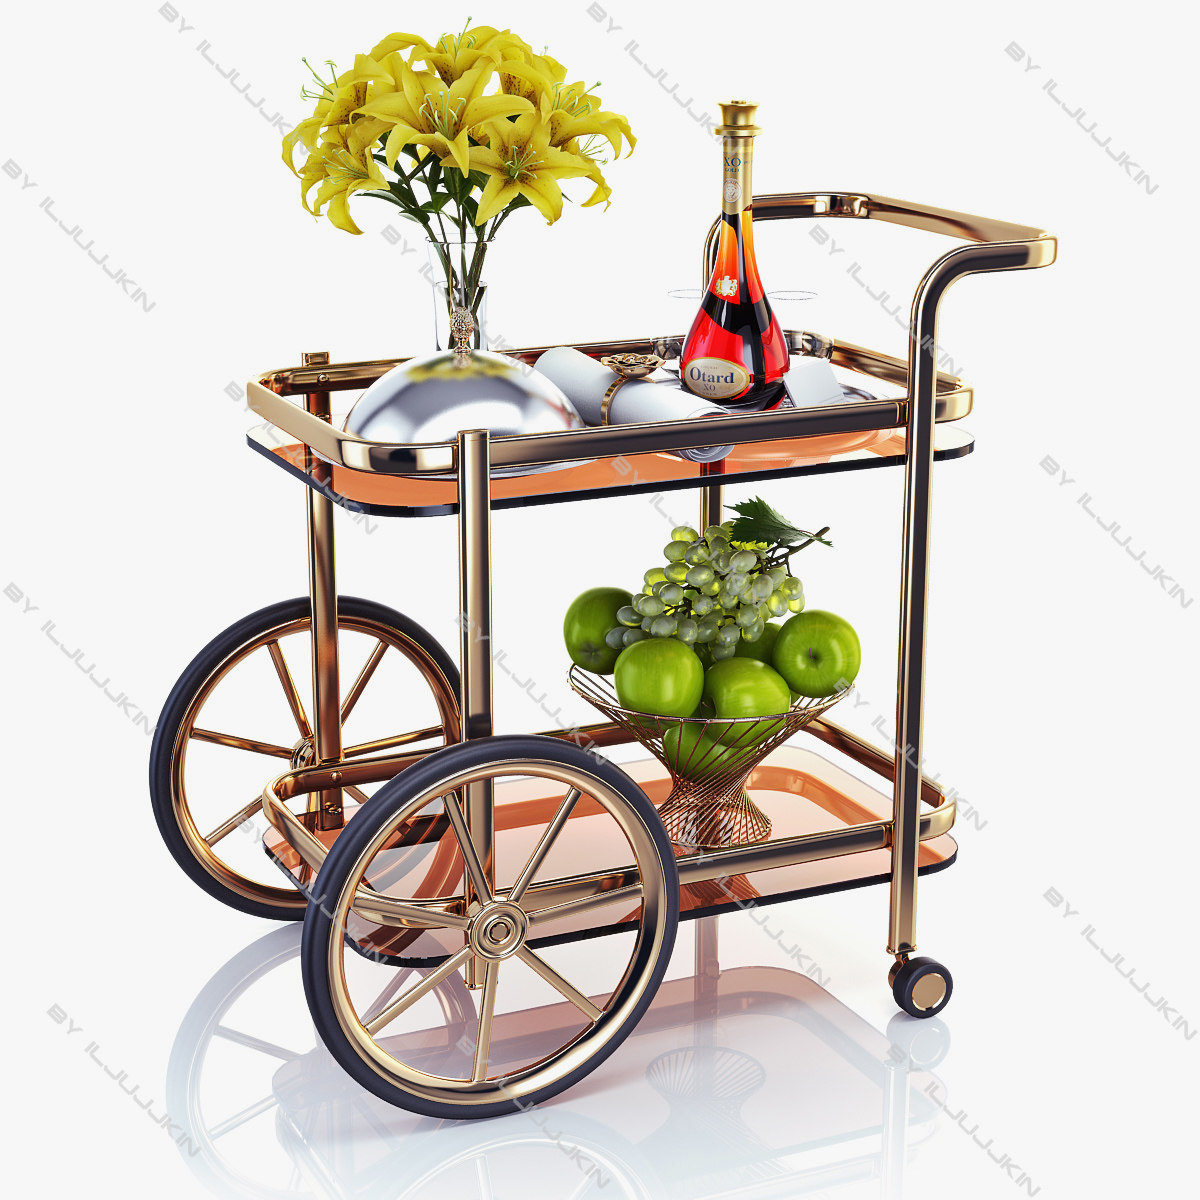 Serving_table_1.jpg